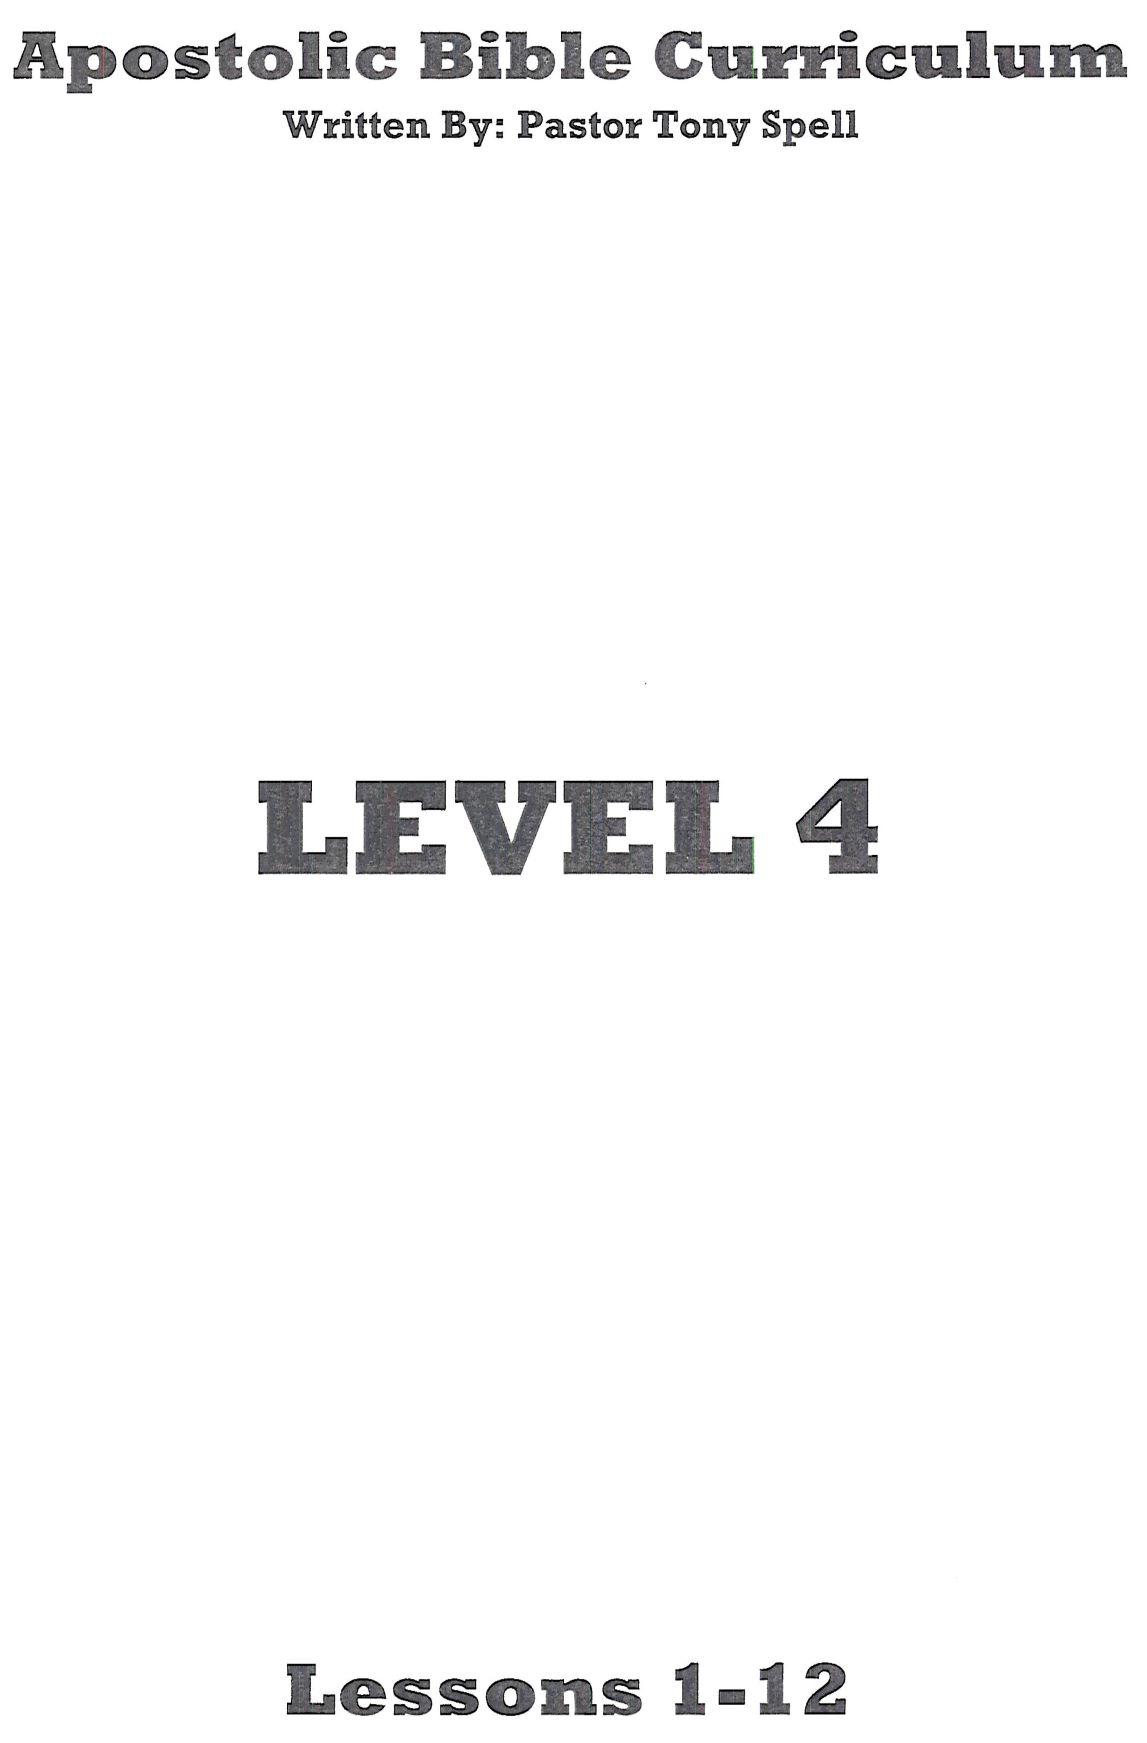 Apostolic Bible Curriculum Level 4 - Tony Spell